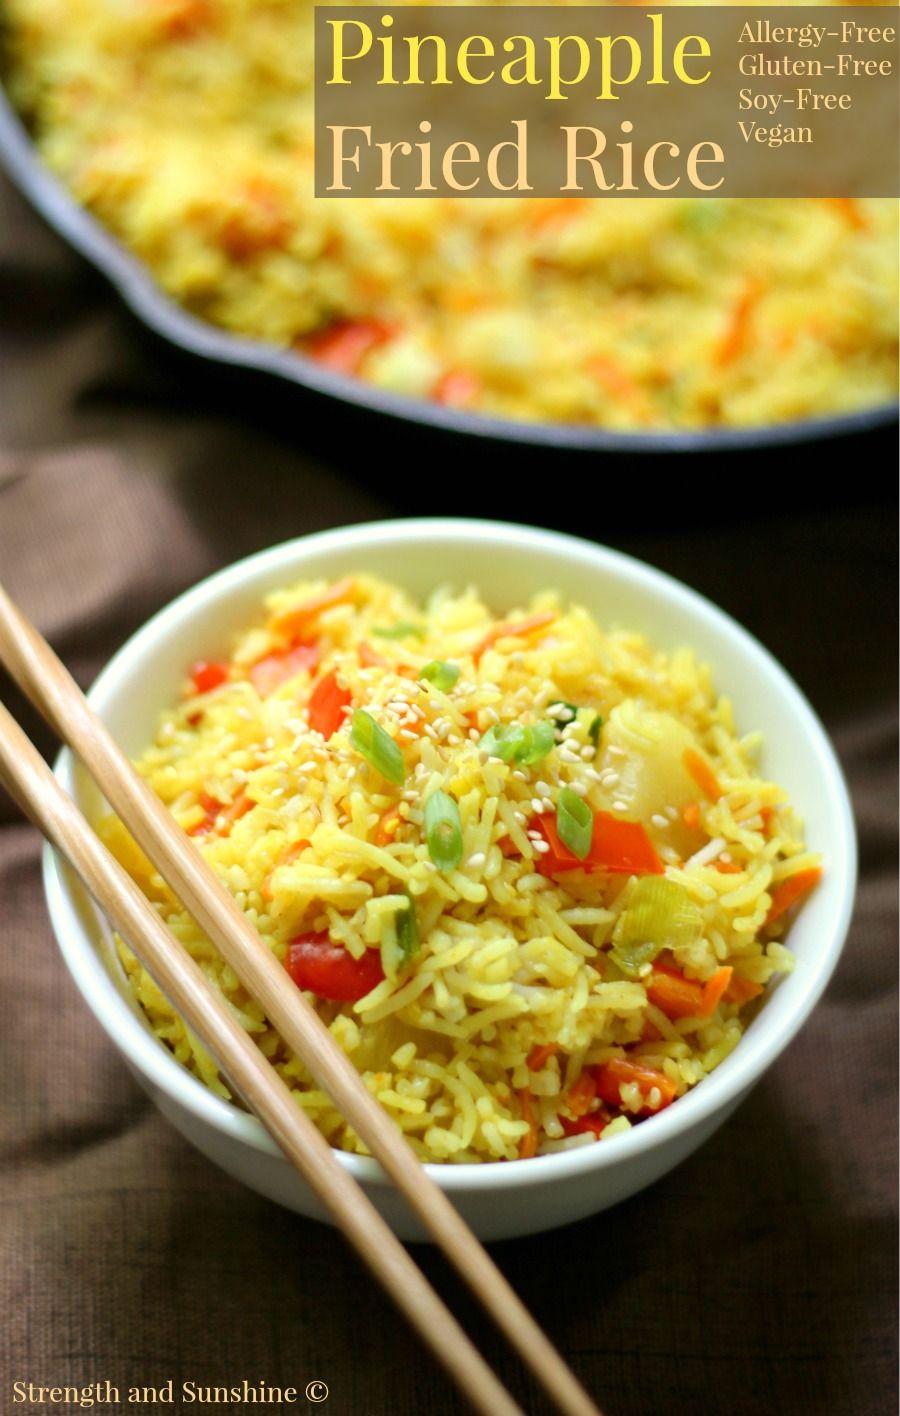 Gluten Free Pineapple Fried Rice Allergy Free Vegan